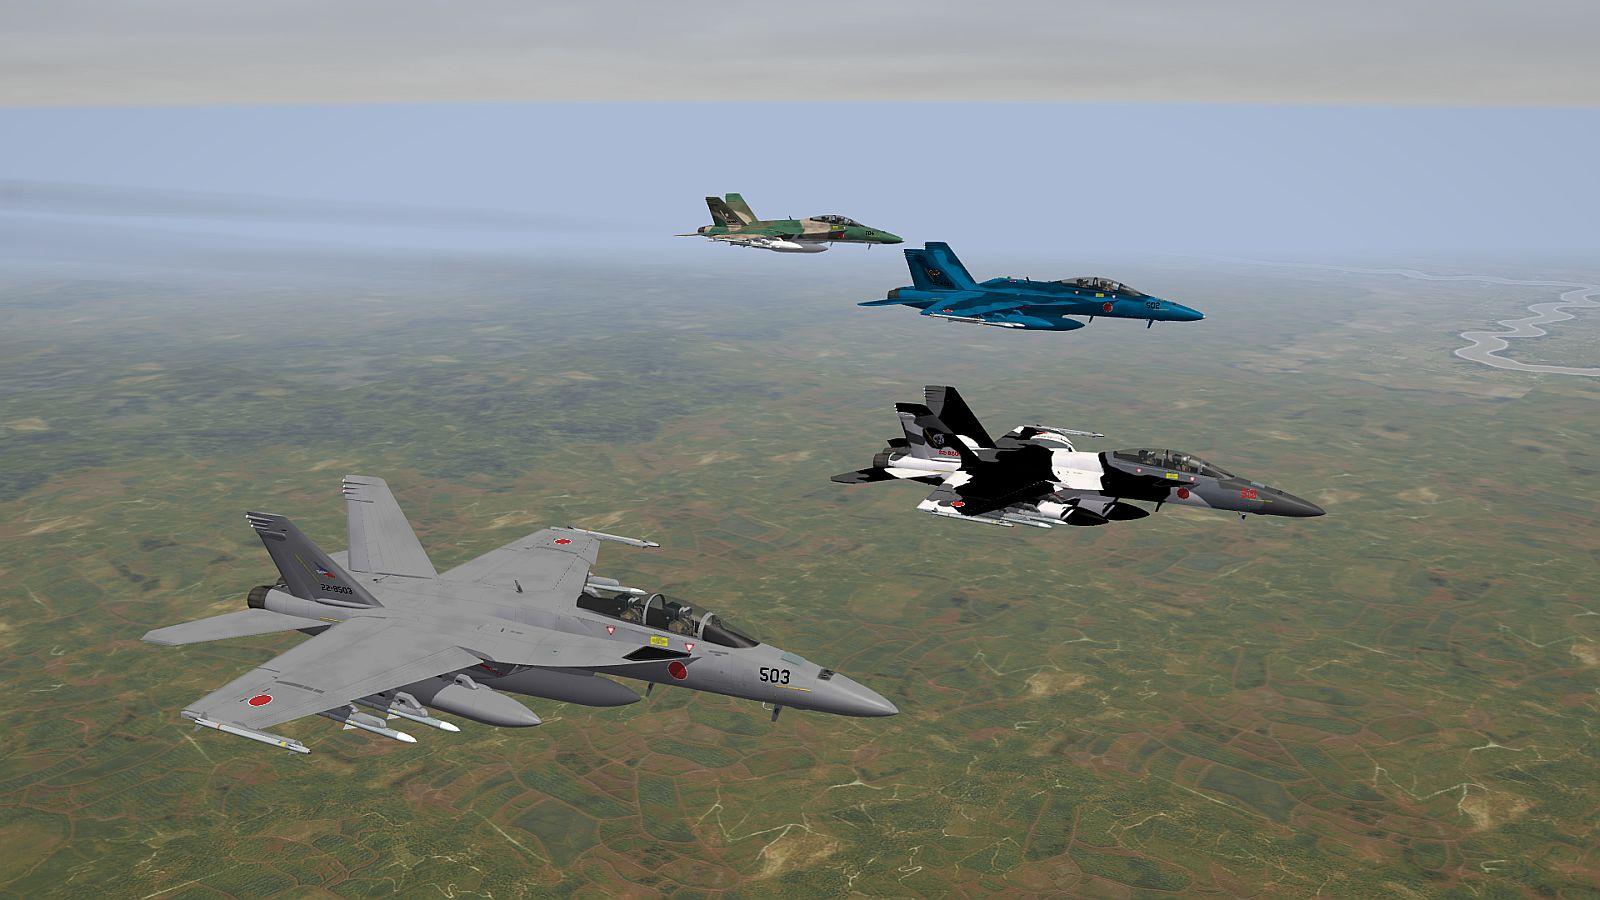 [Renewed] Boeing/Mitsubishi FA-18FJ Super Hornet